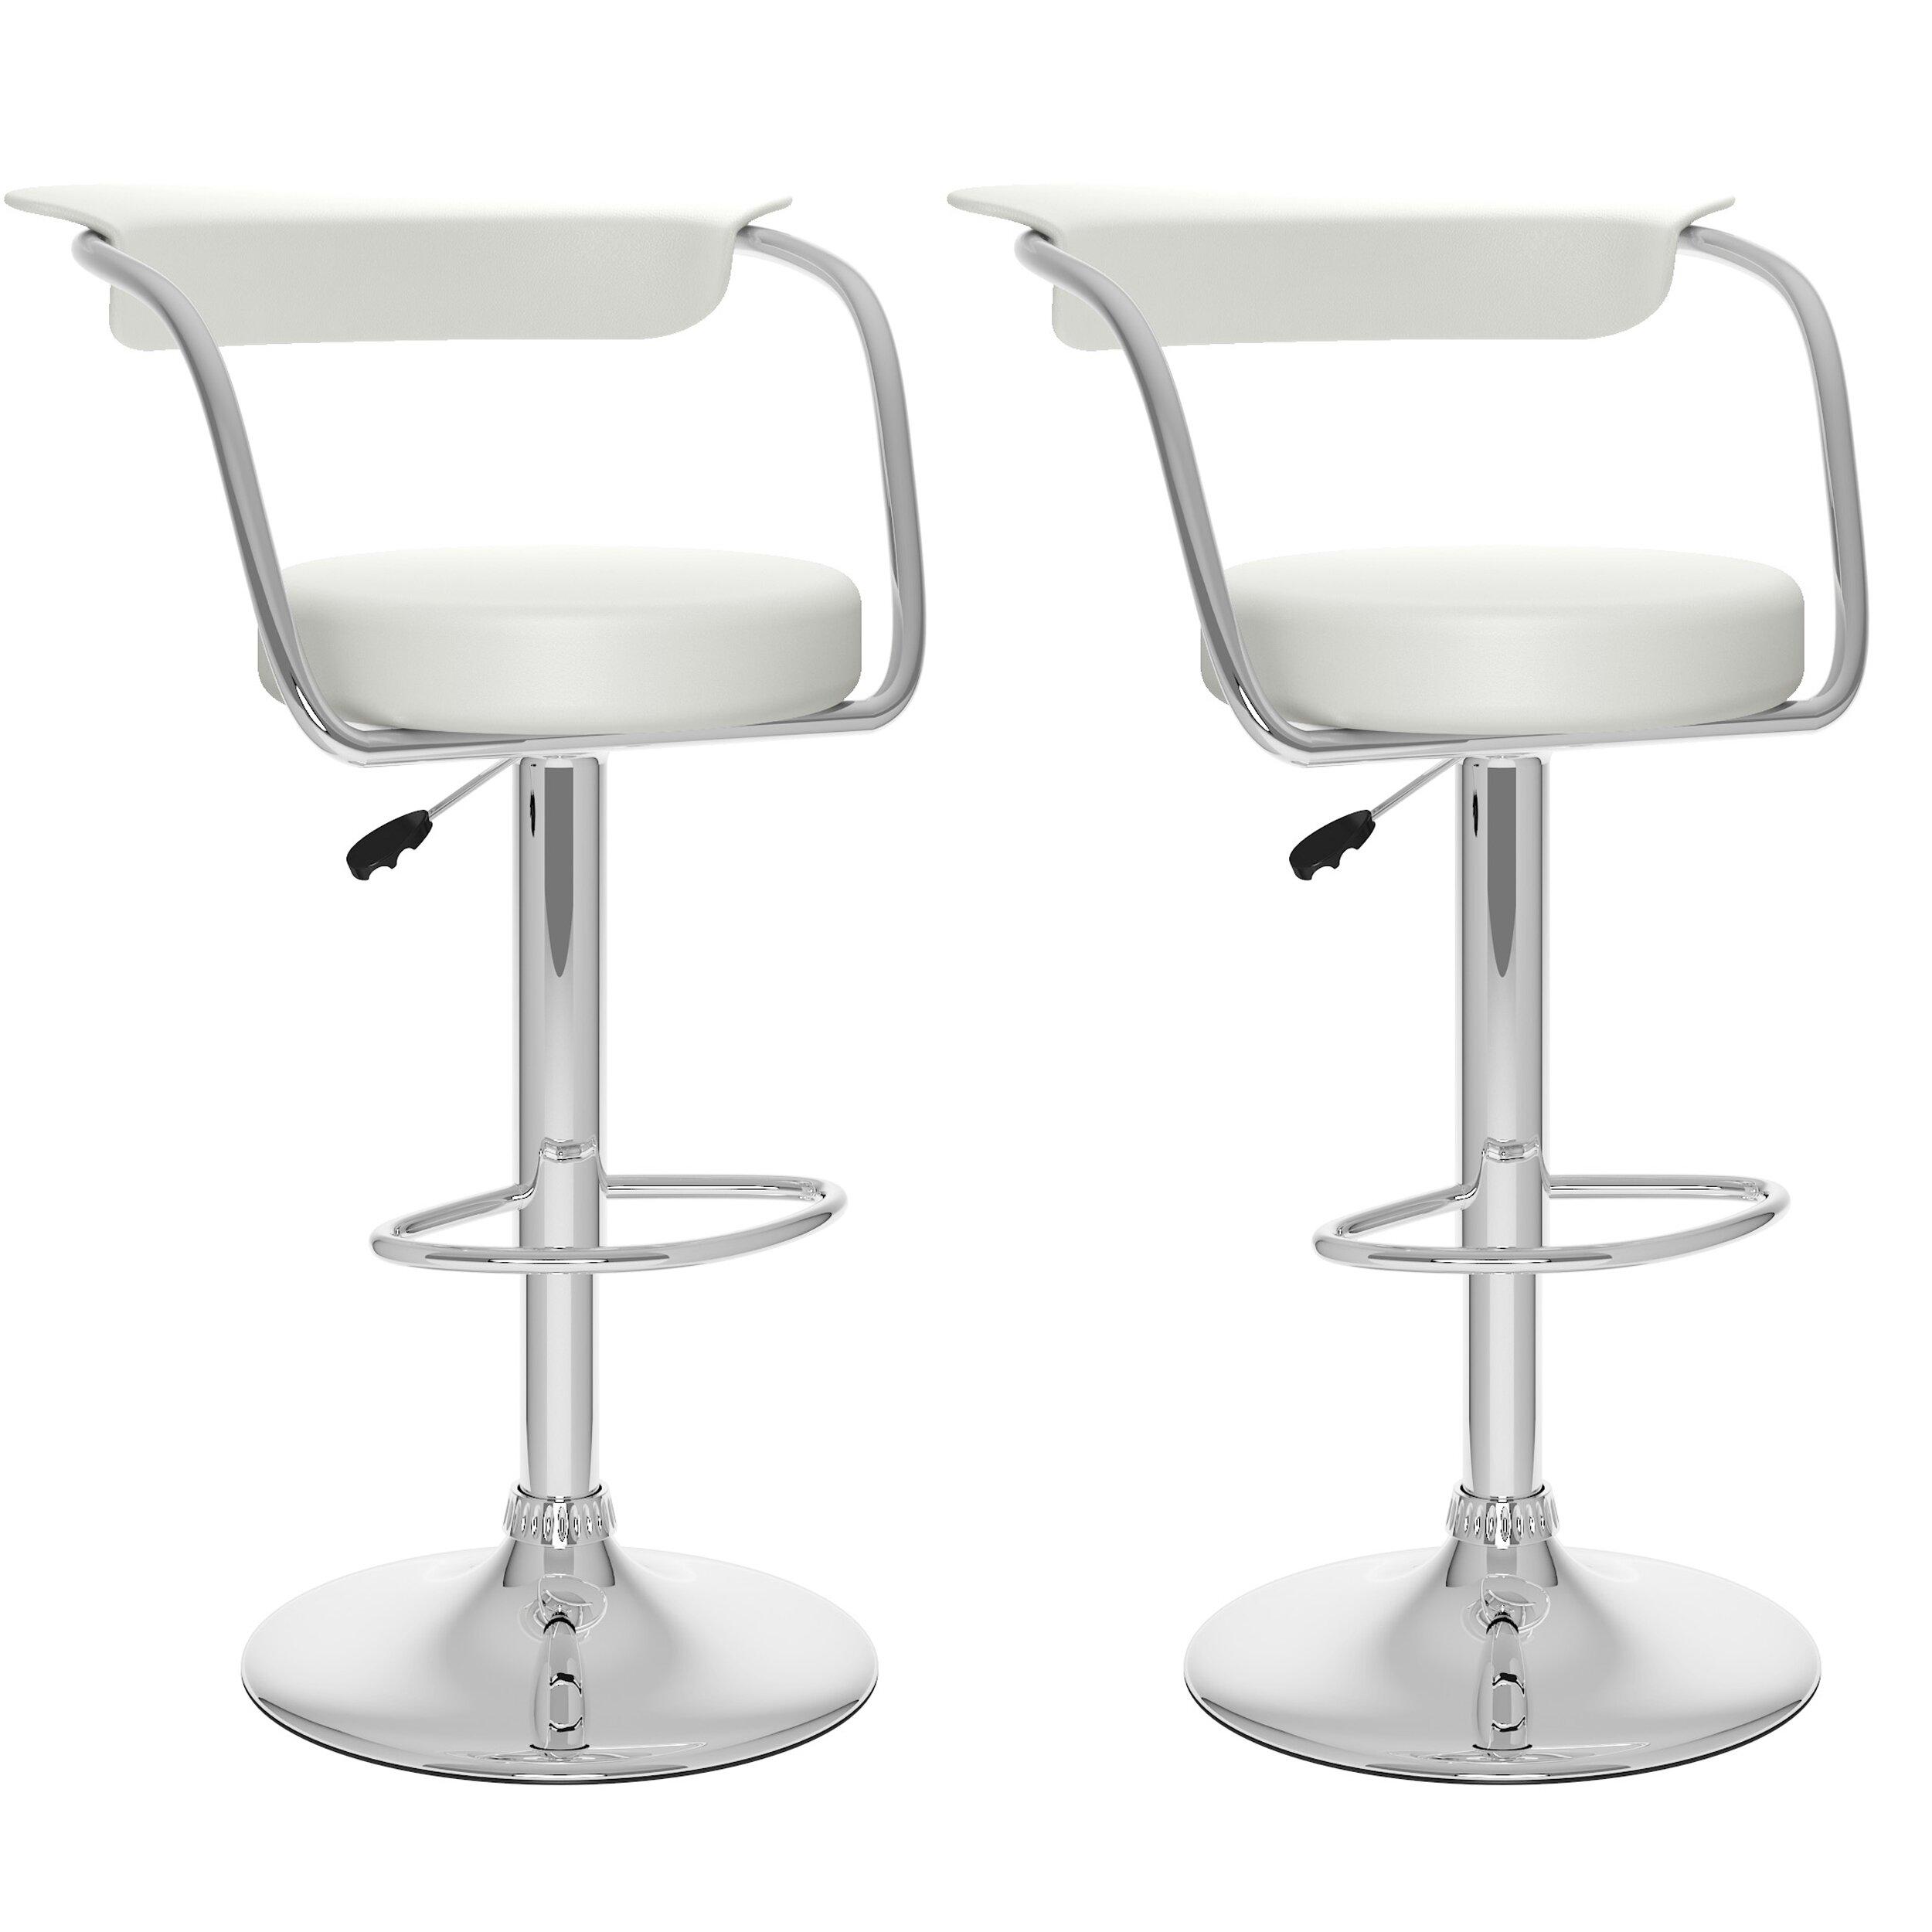 Dcor design adjustable height swivel bar stool reviews for Adjustable height bar stools